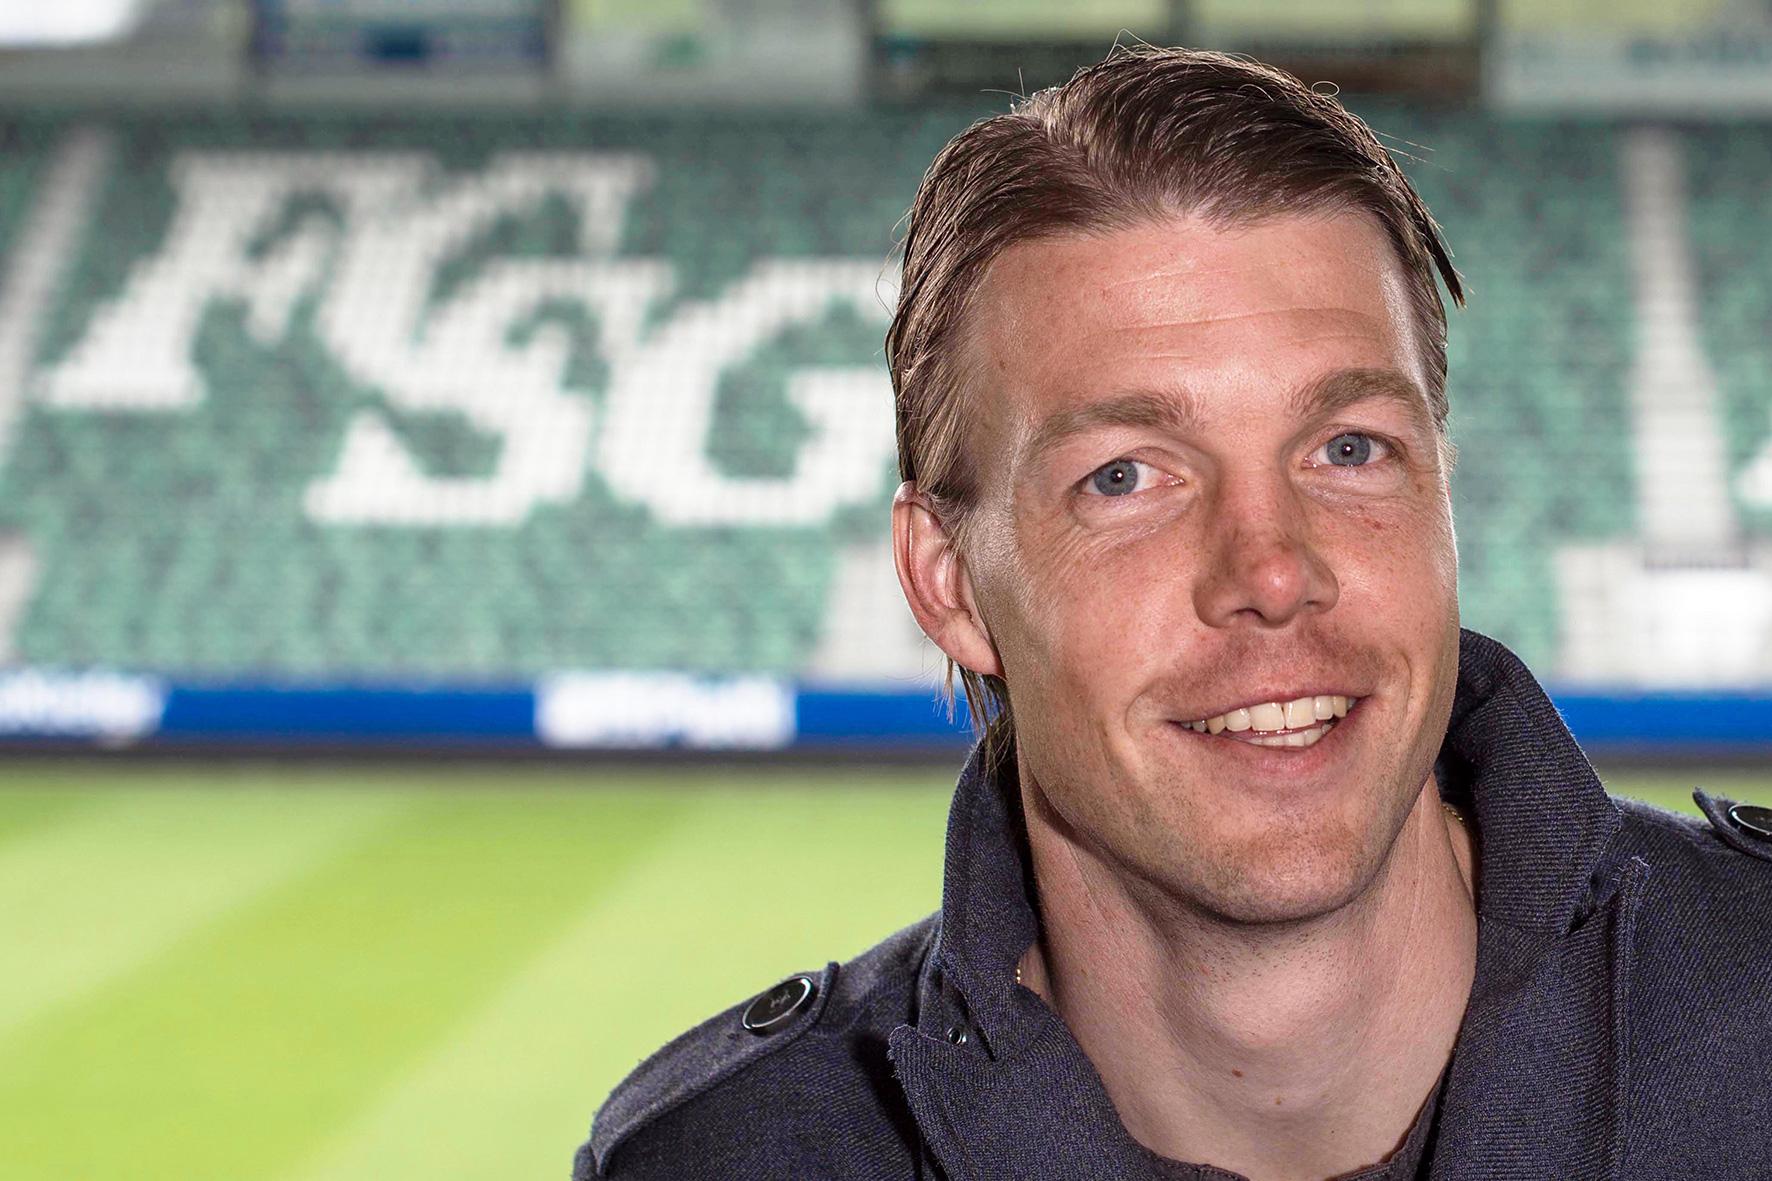 Raiffeisen Super League Saisonstart Auf Teleclub Neuer